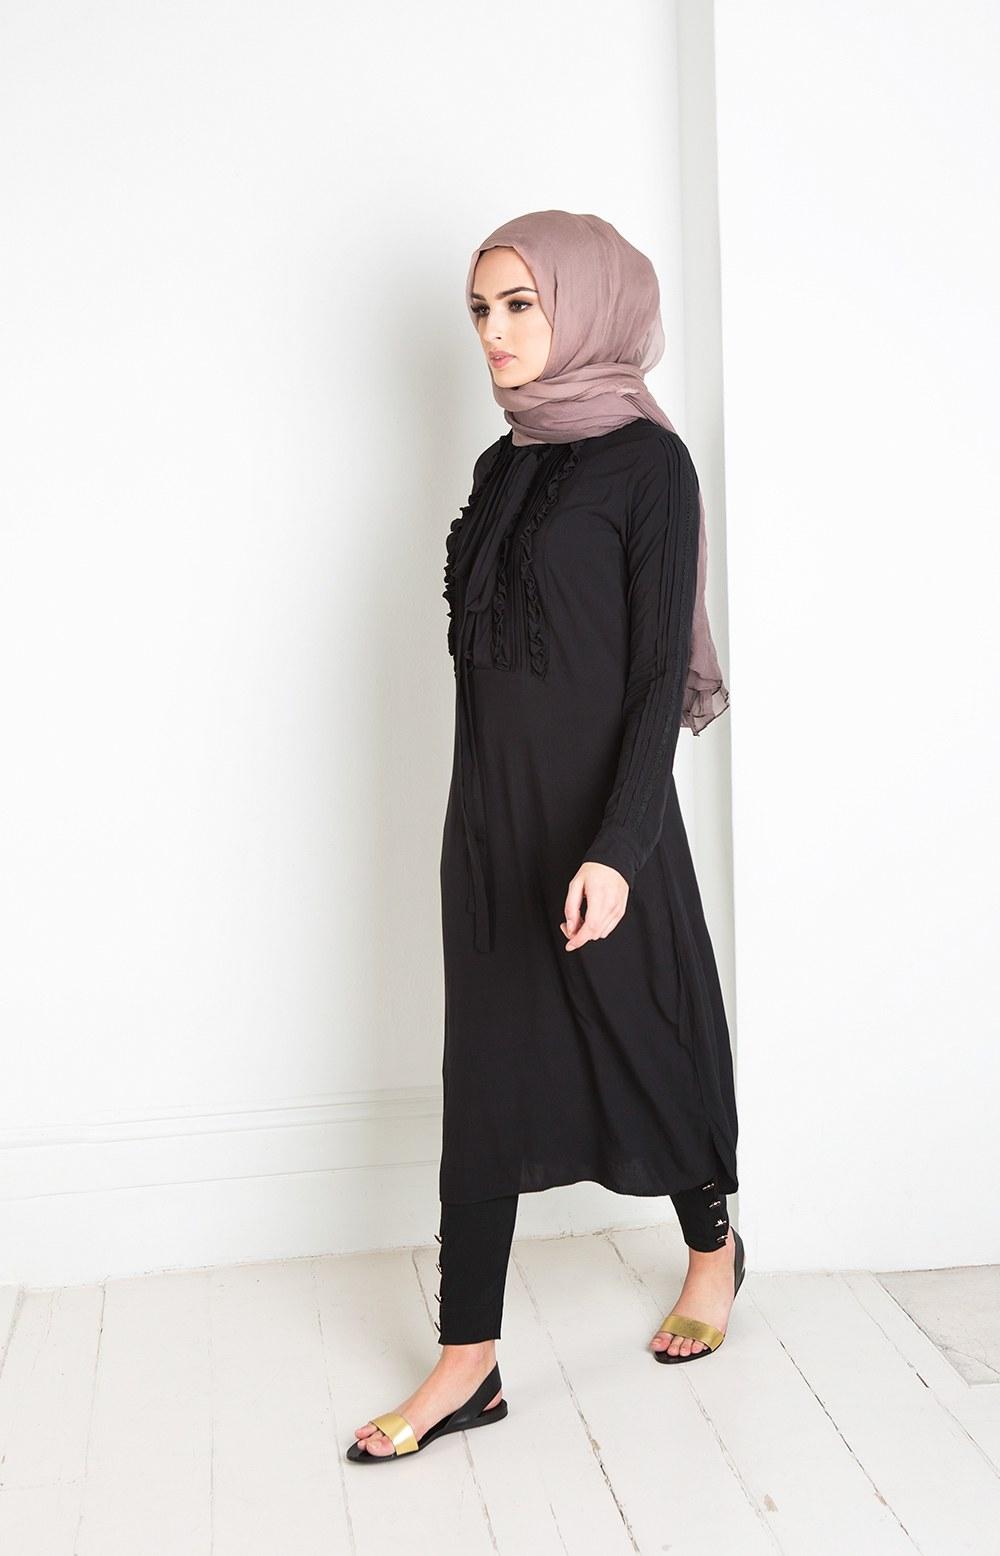 Inspirasi Model Baju Lebaran Ipdd 25 Trend Model Baju Muslim Lebaran 2018 Simple & Modis